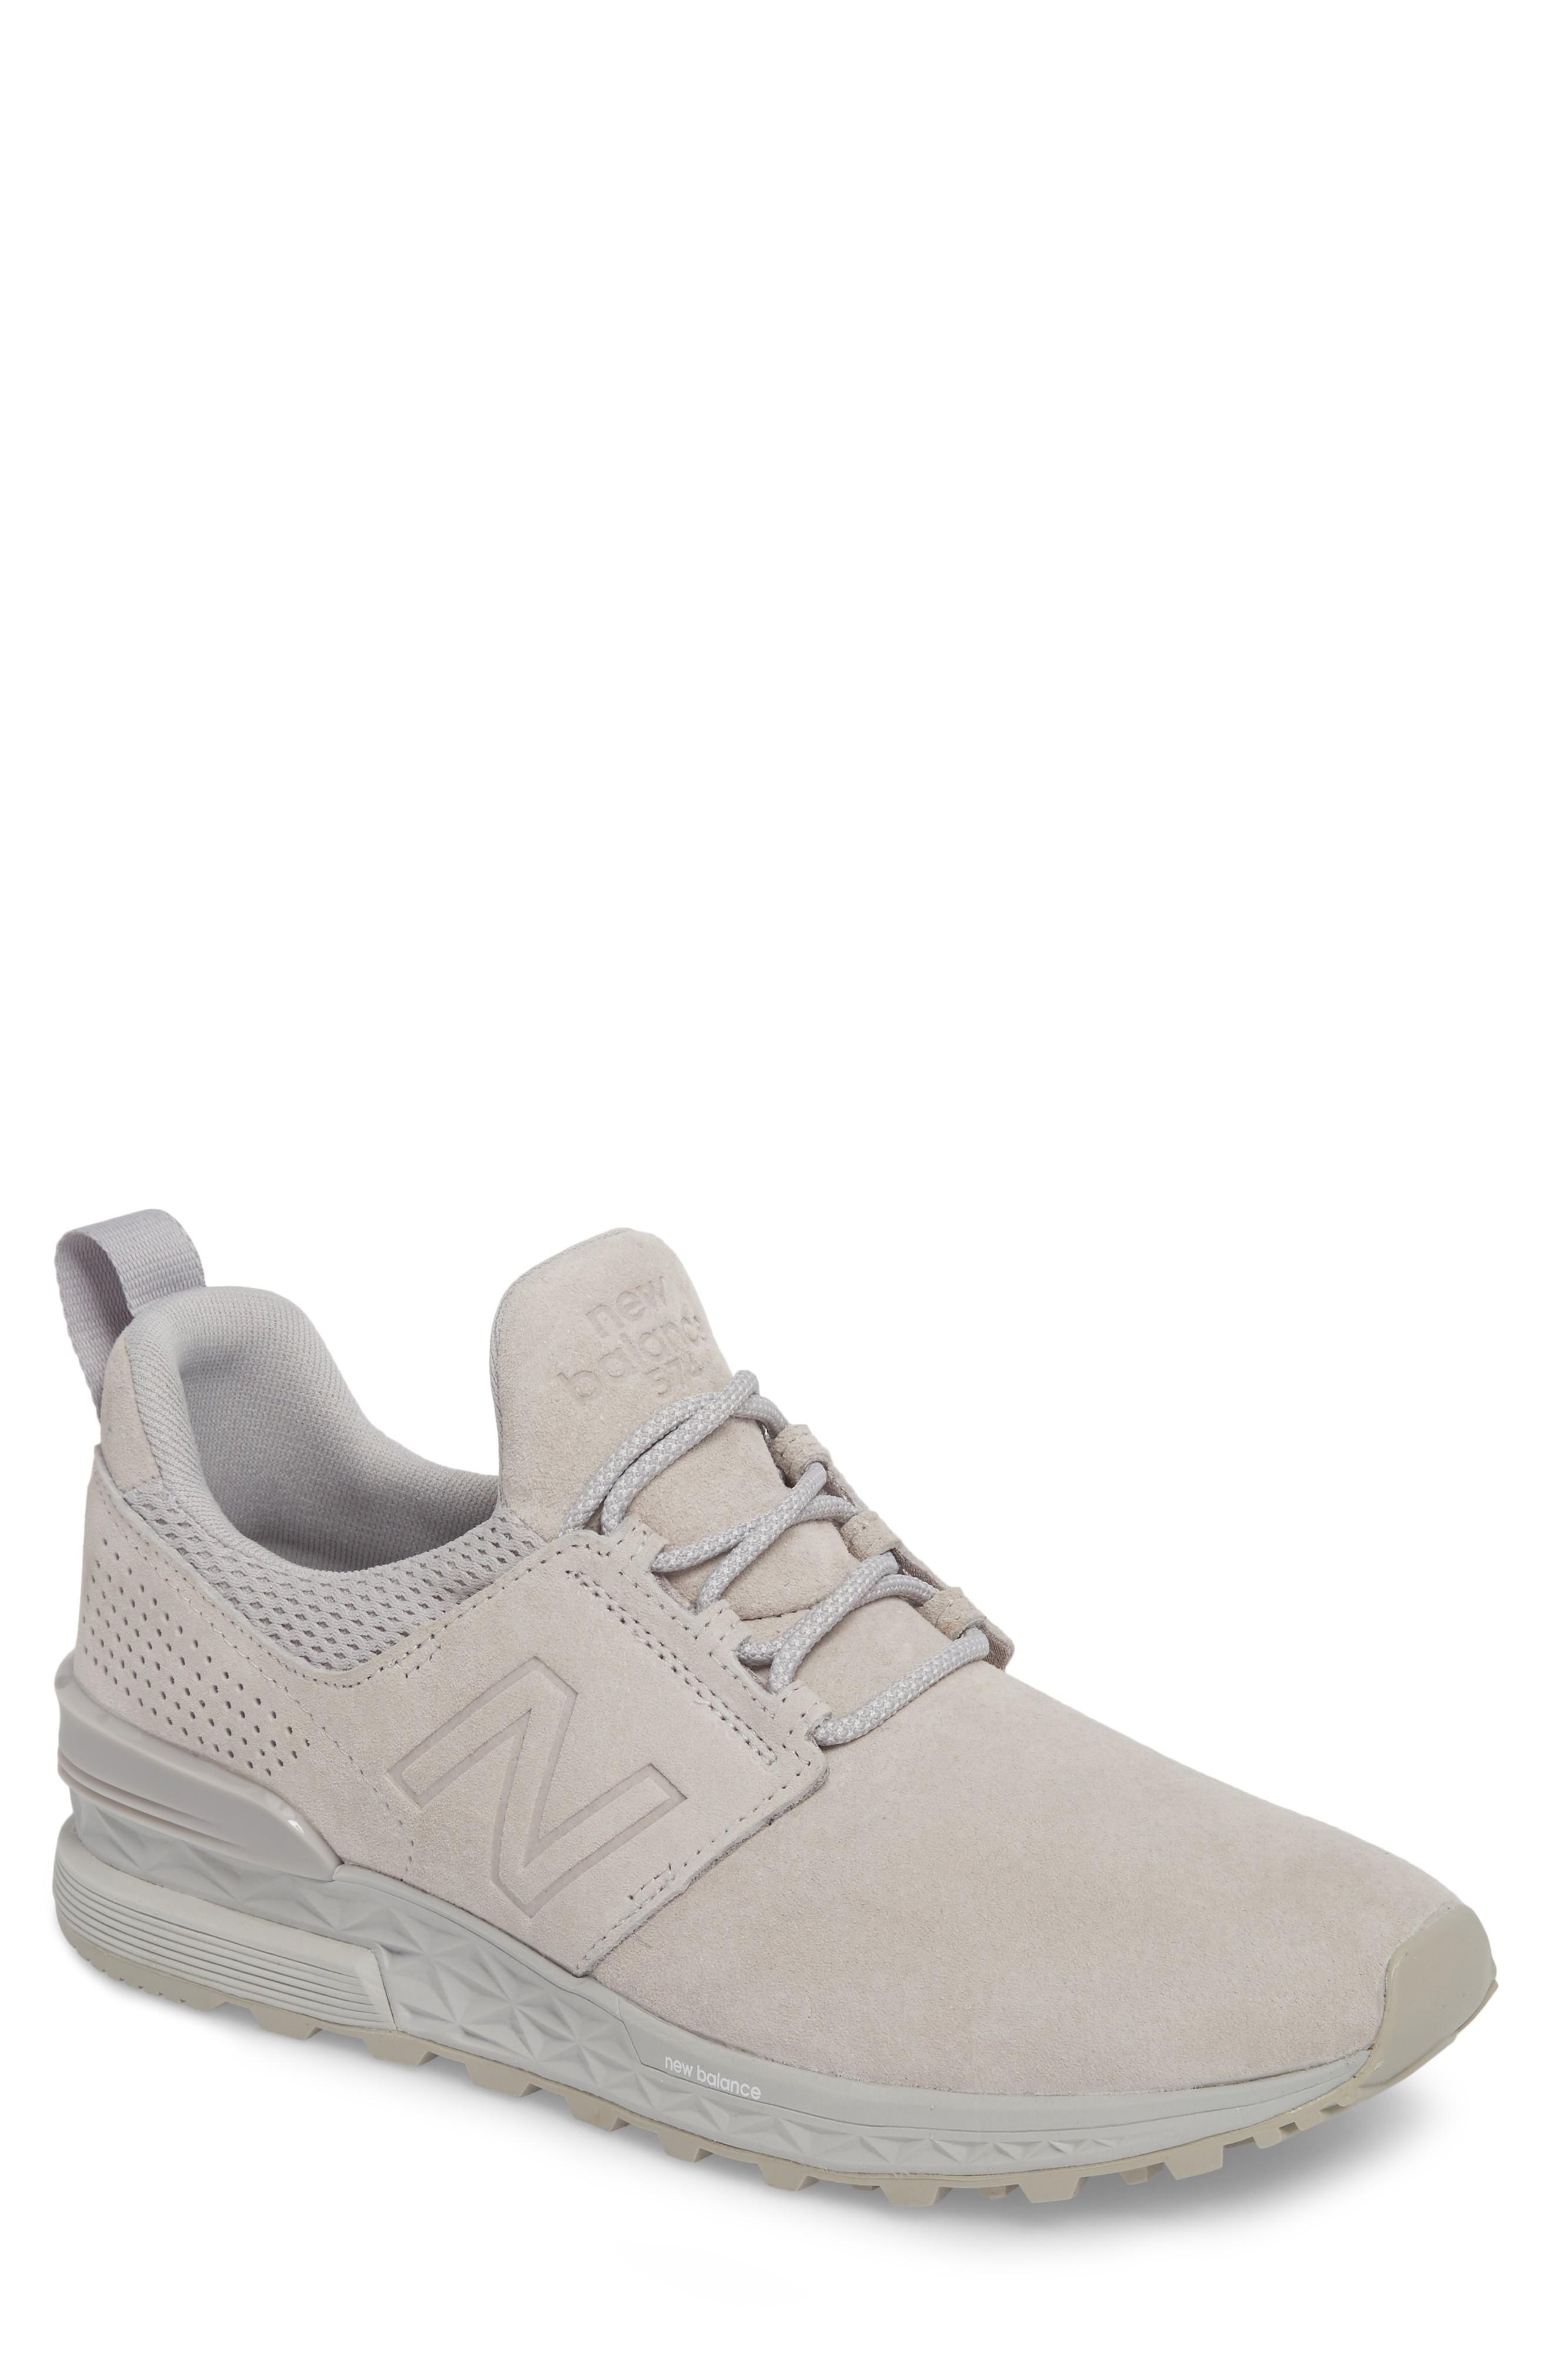 New Balance 574 Decon Sneaker In Overcast